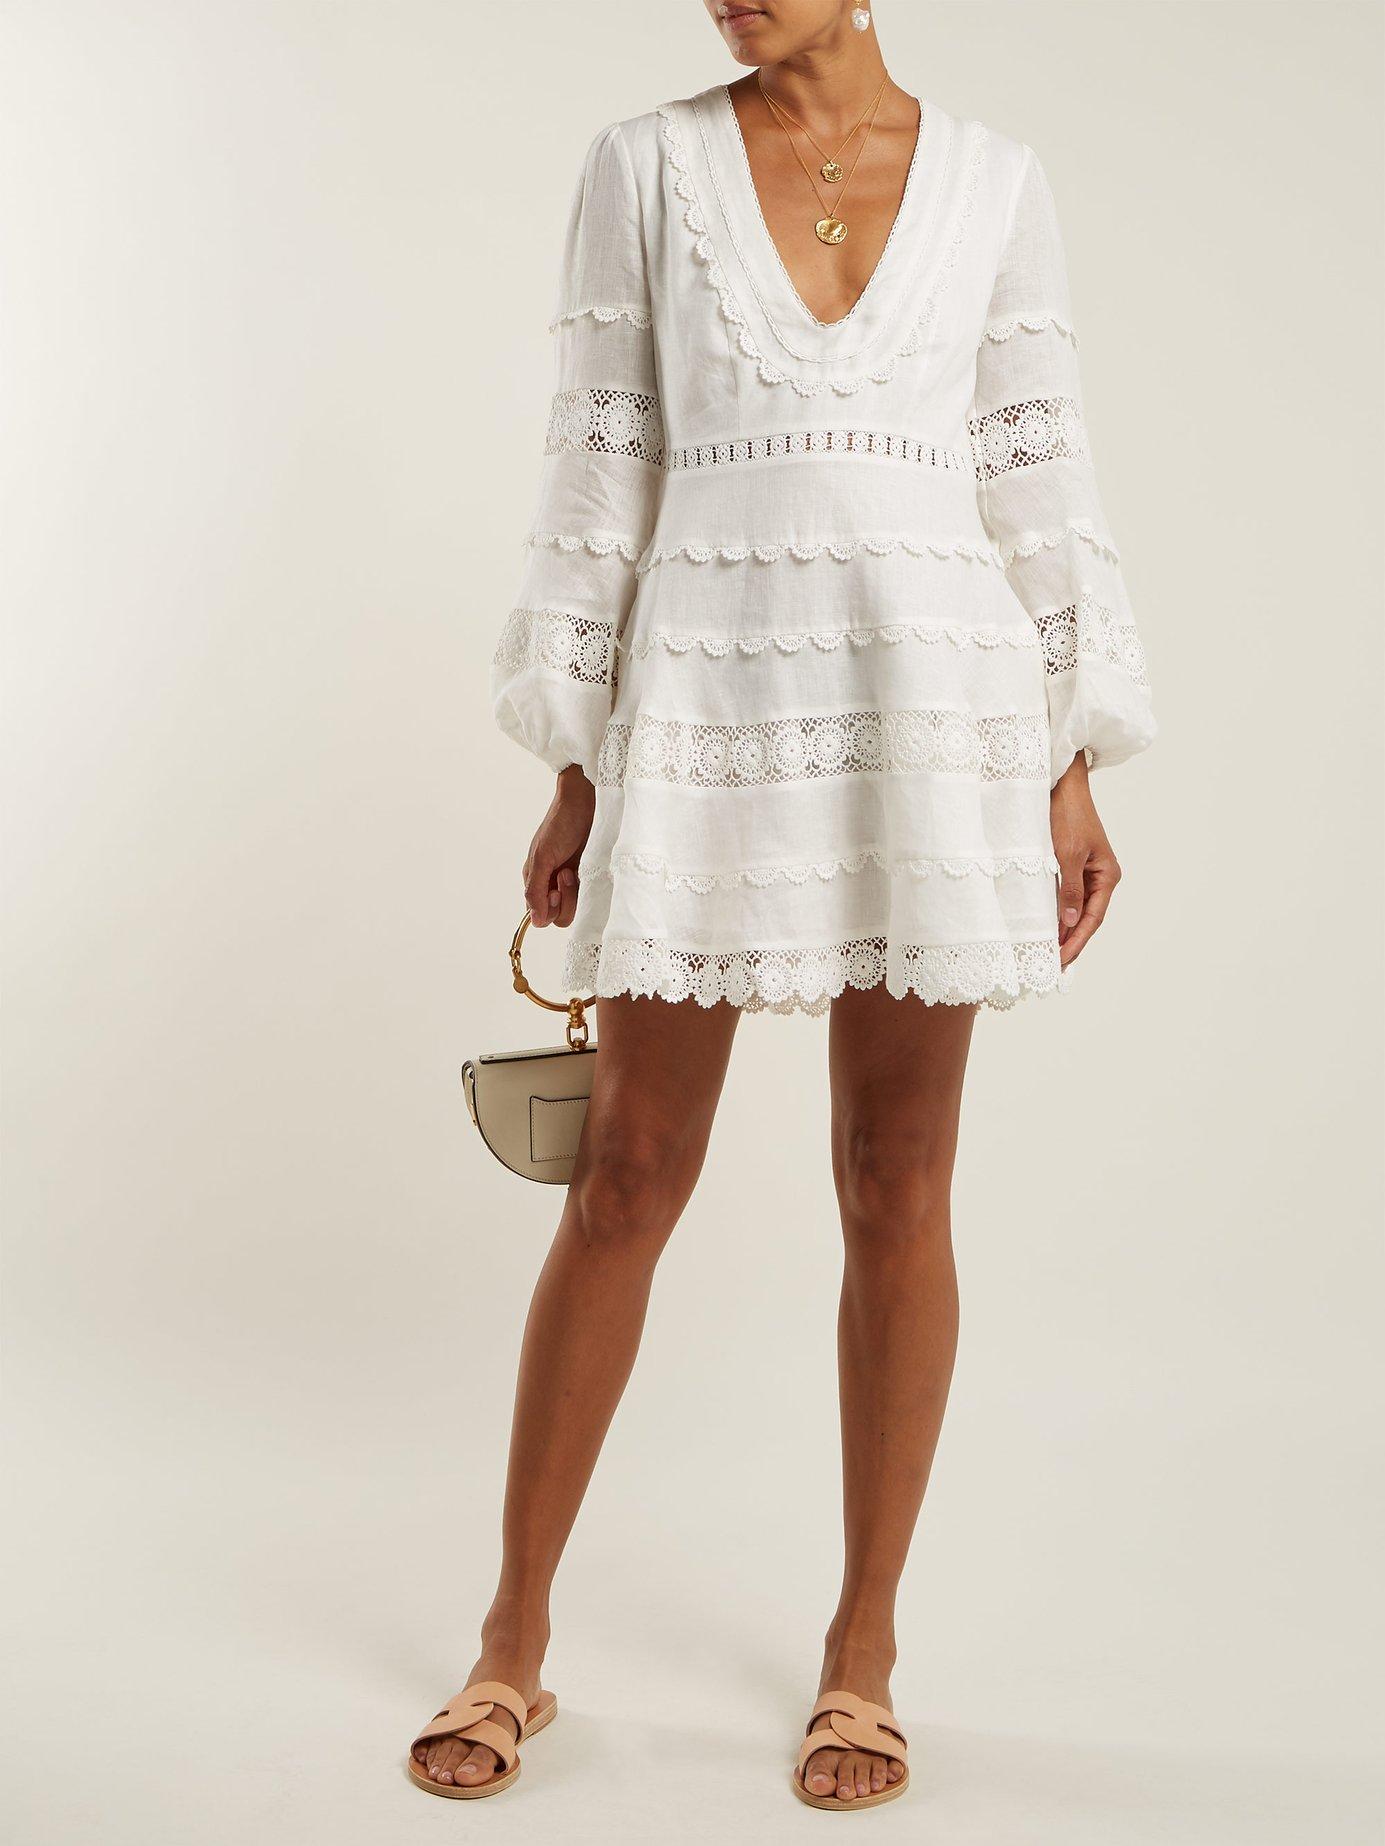 Castile crochet-trimmed linen dress by Zimmermann